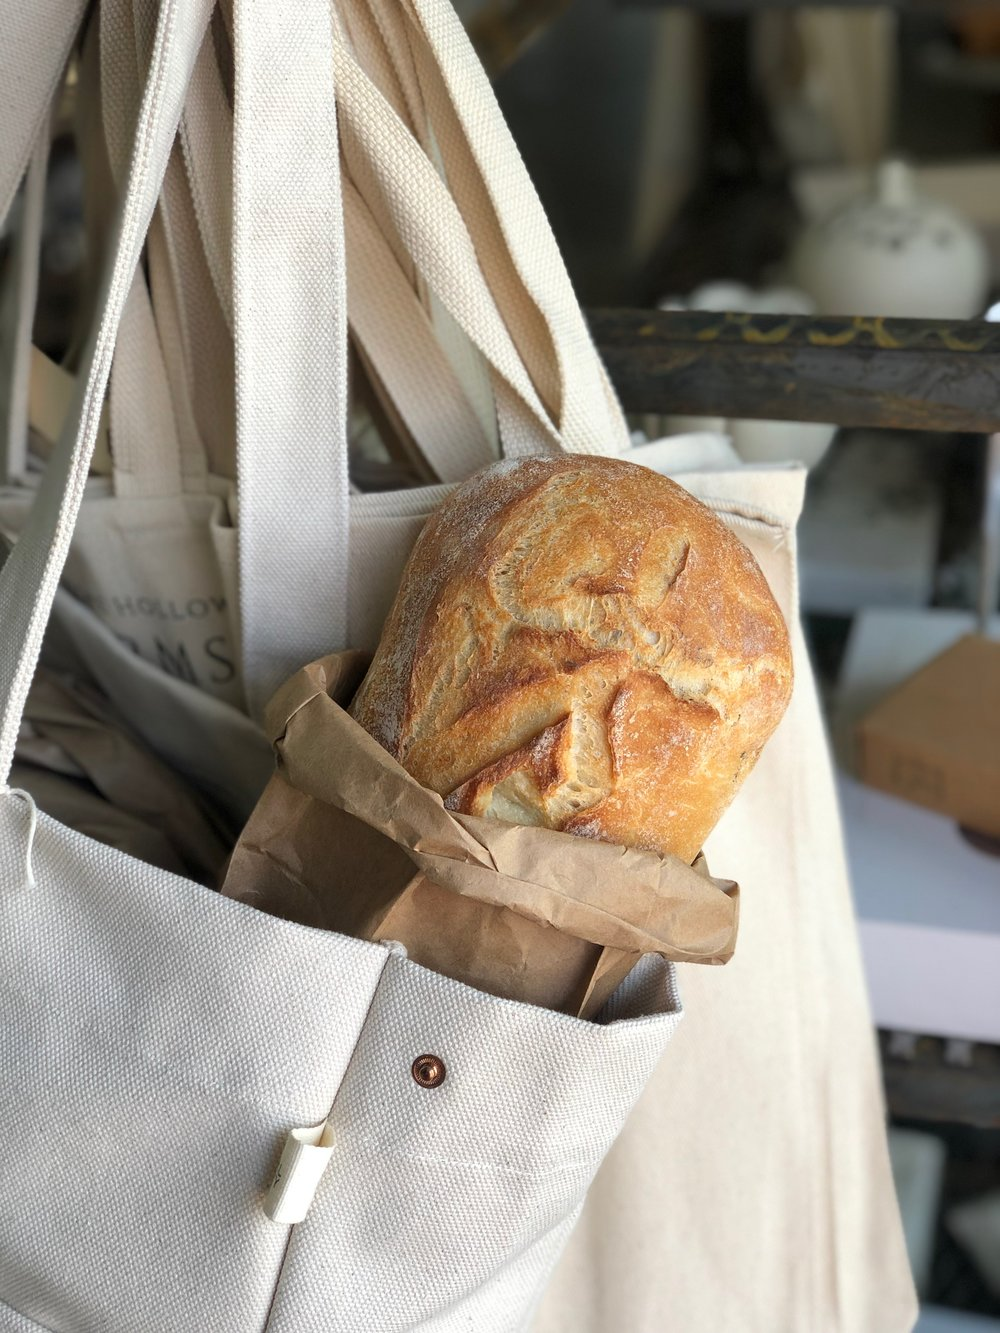 Herbed Country Bread  /   Hinkel's Bakery